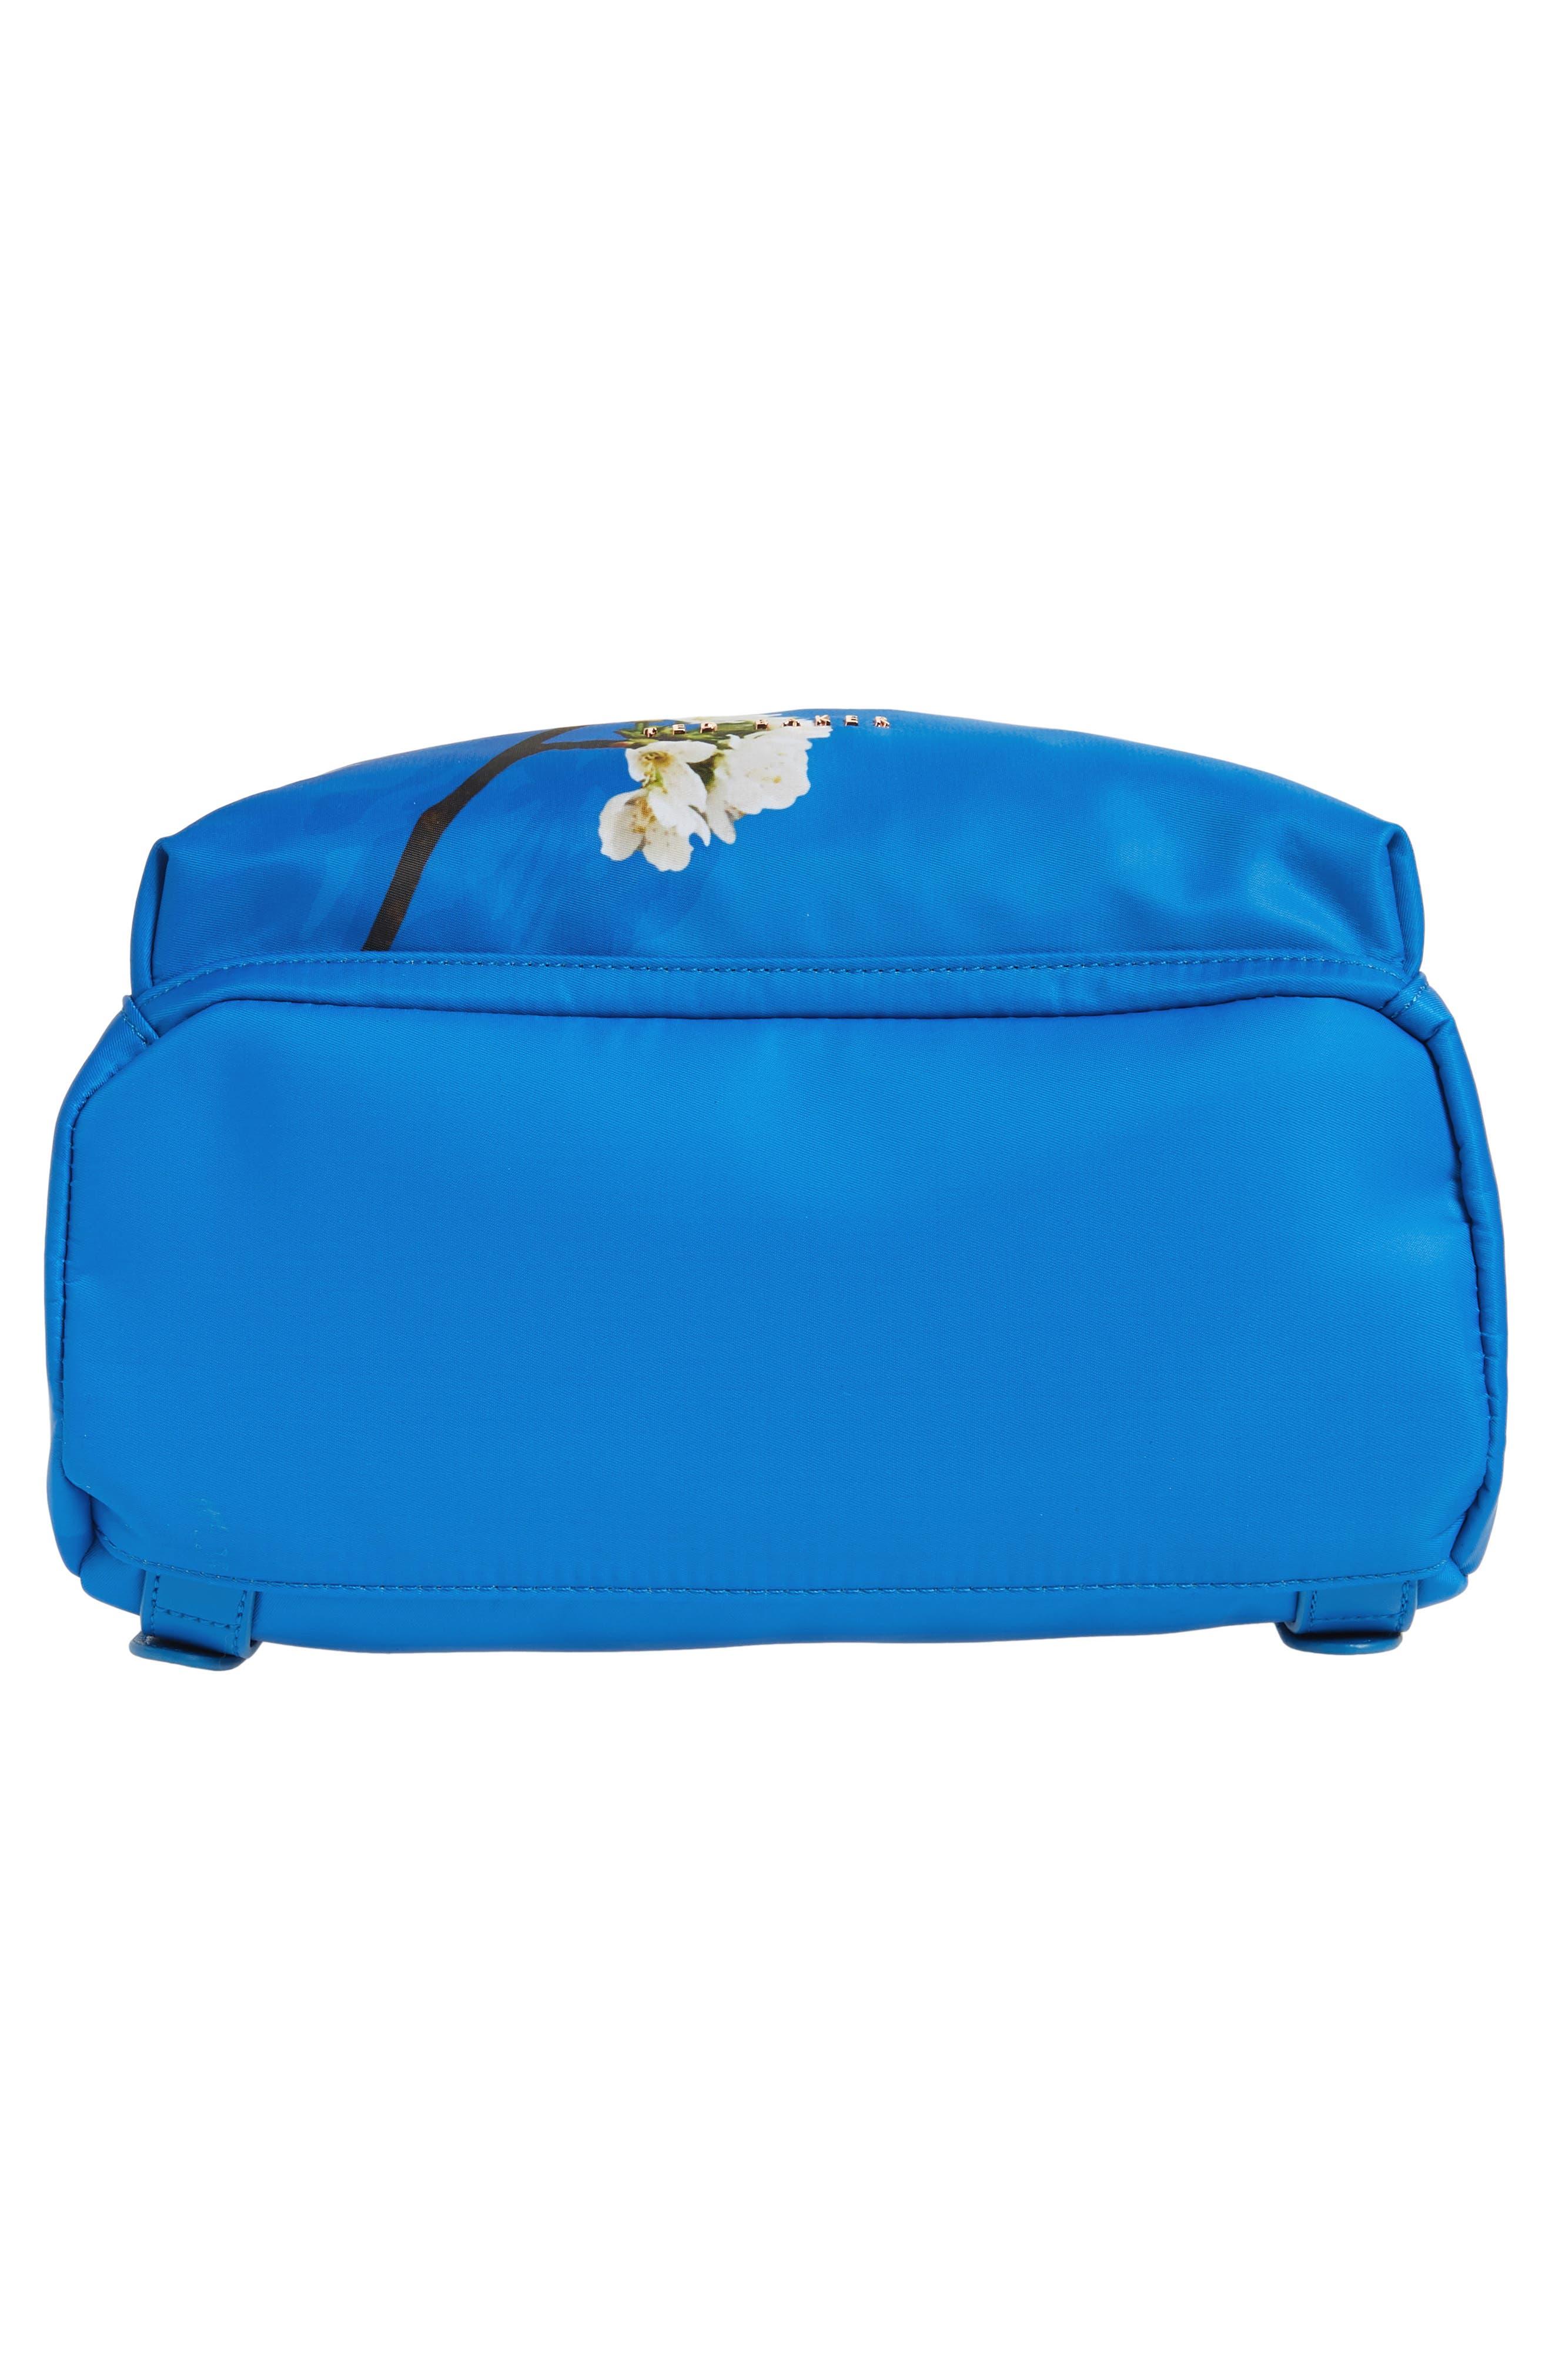 Harmony Print Backpack,                             Alternate thumbnail 6, color,                             Bright Blue